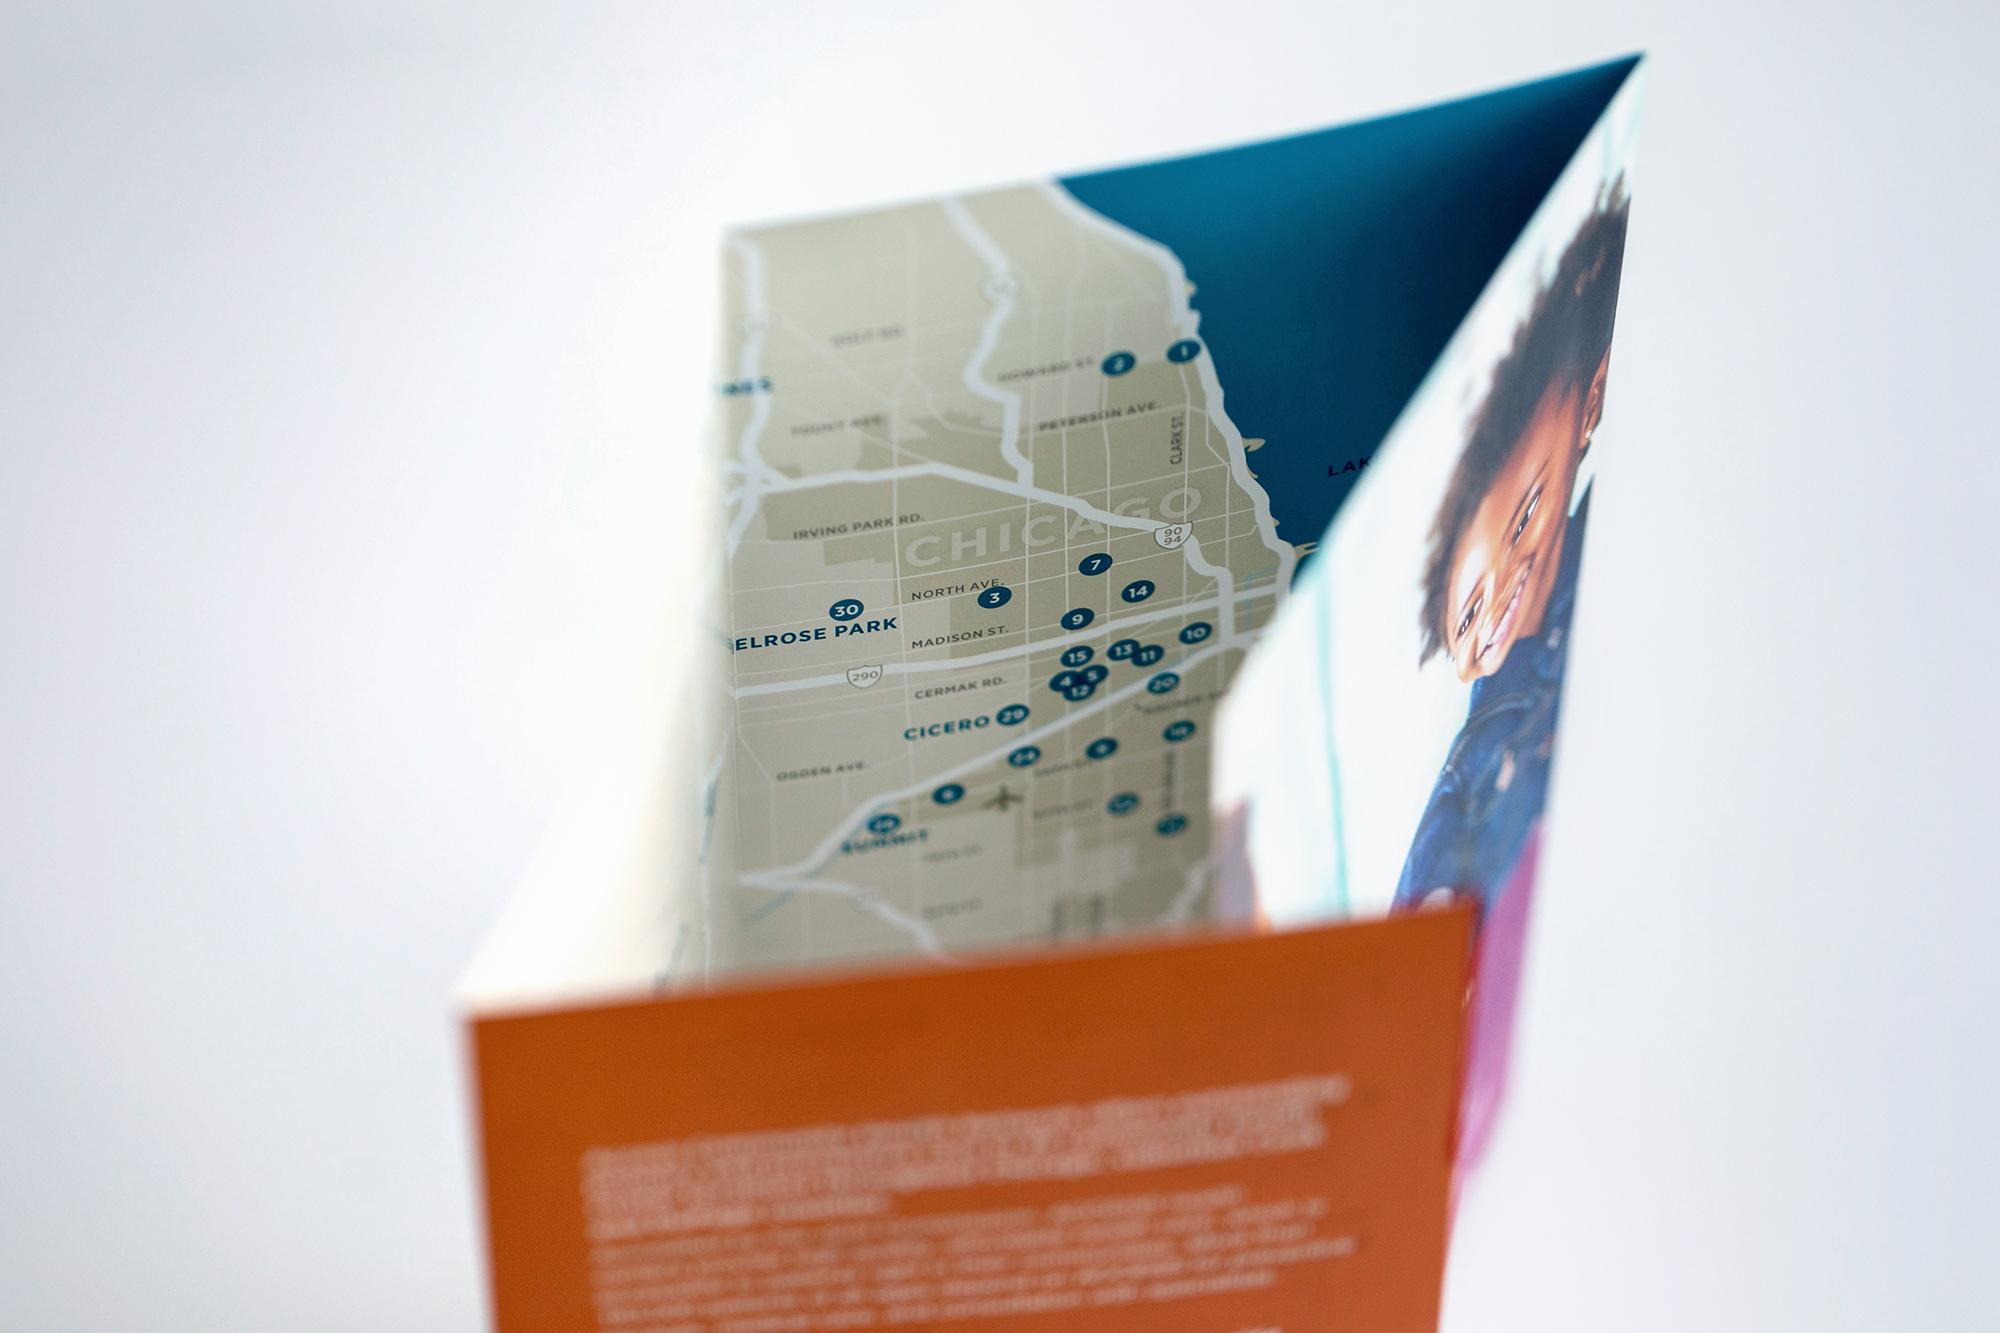 Forward Design Chicago Marketing_LDP-5797_2000px copy.jpg